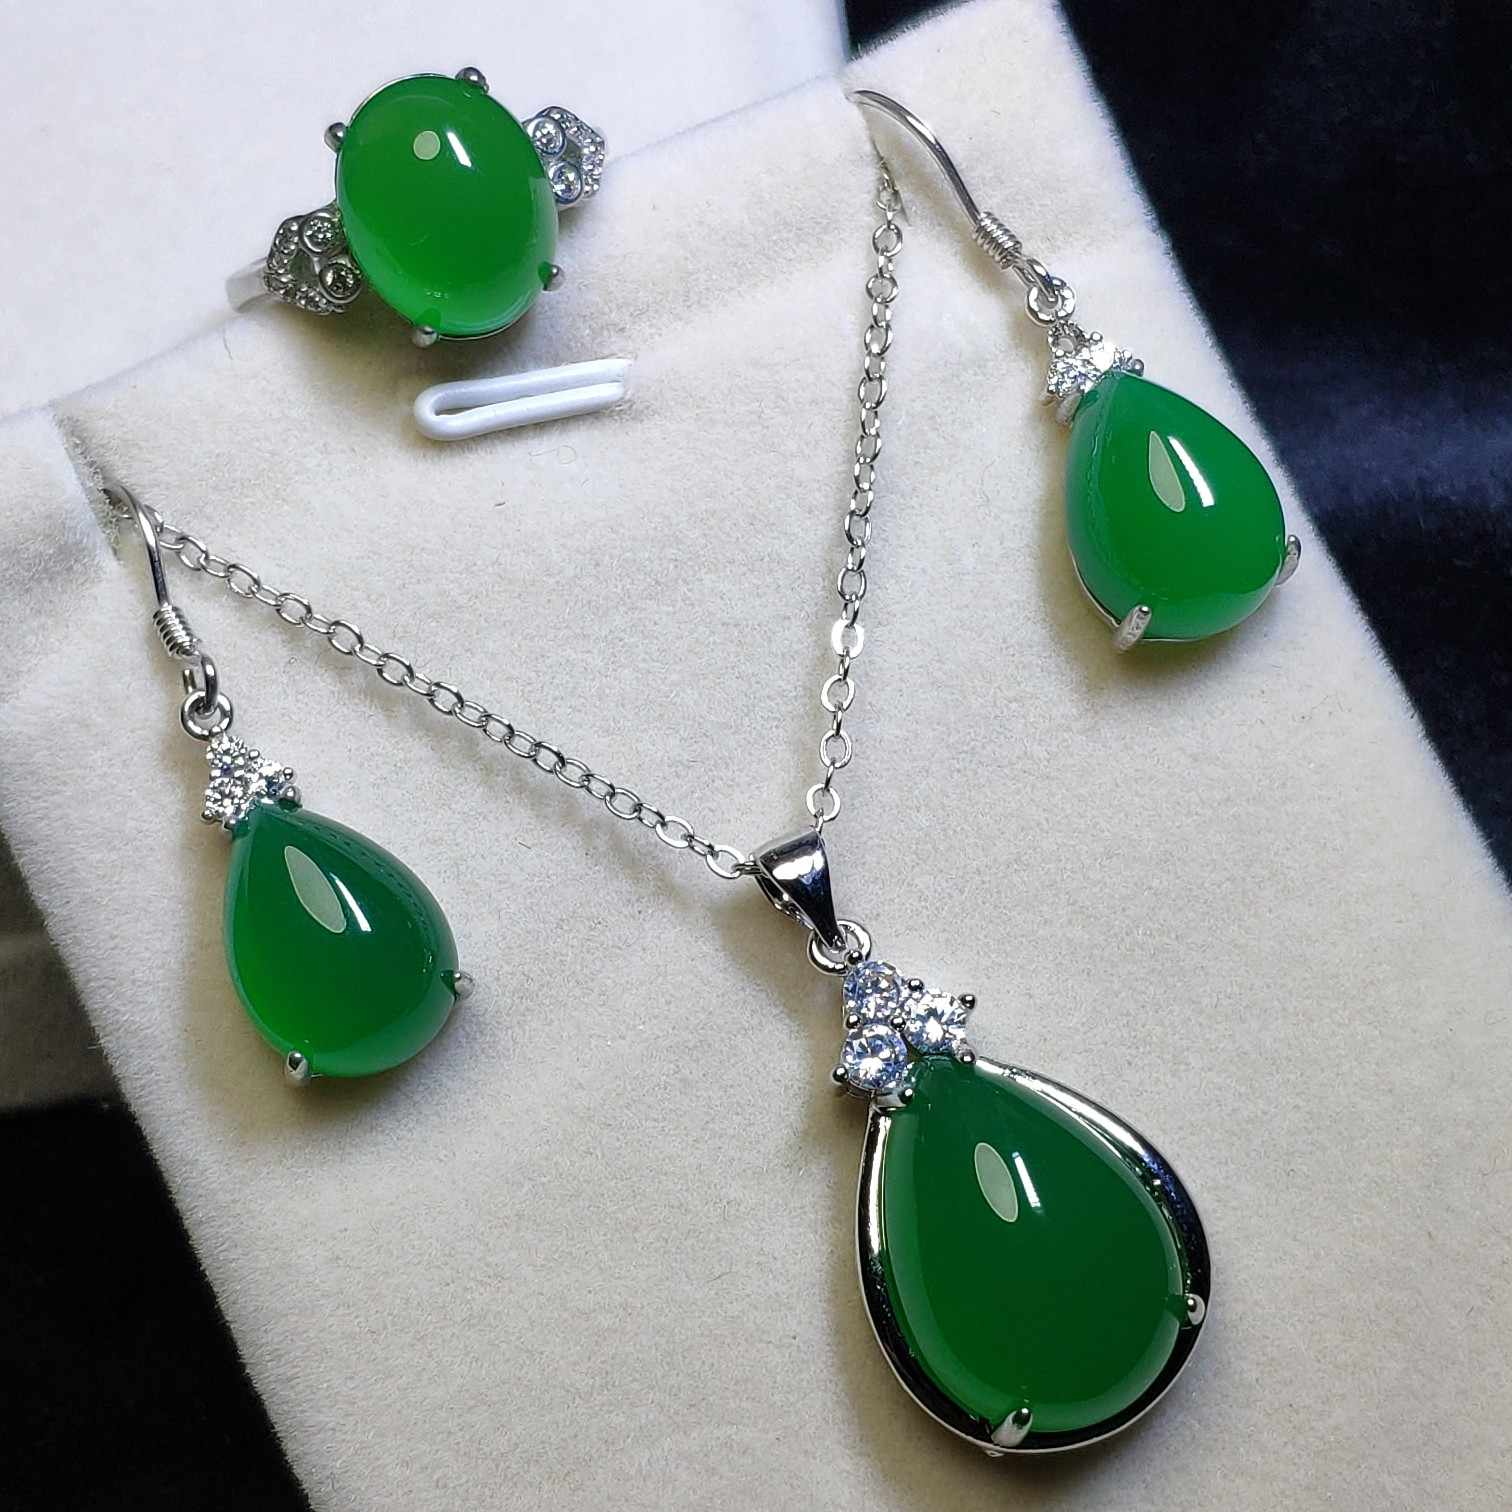 Letsfun 3 Pcs S925 Sterling Silver Natural Hijau Giok Batu Permata Anting-Anting Kalung Cincin Set Perhiasan Wanita Mewah